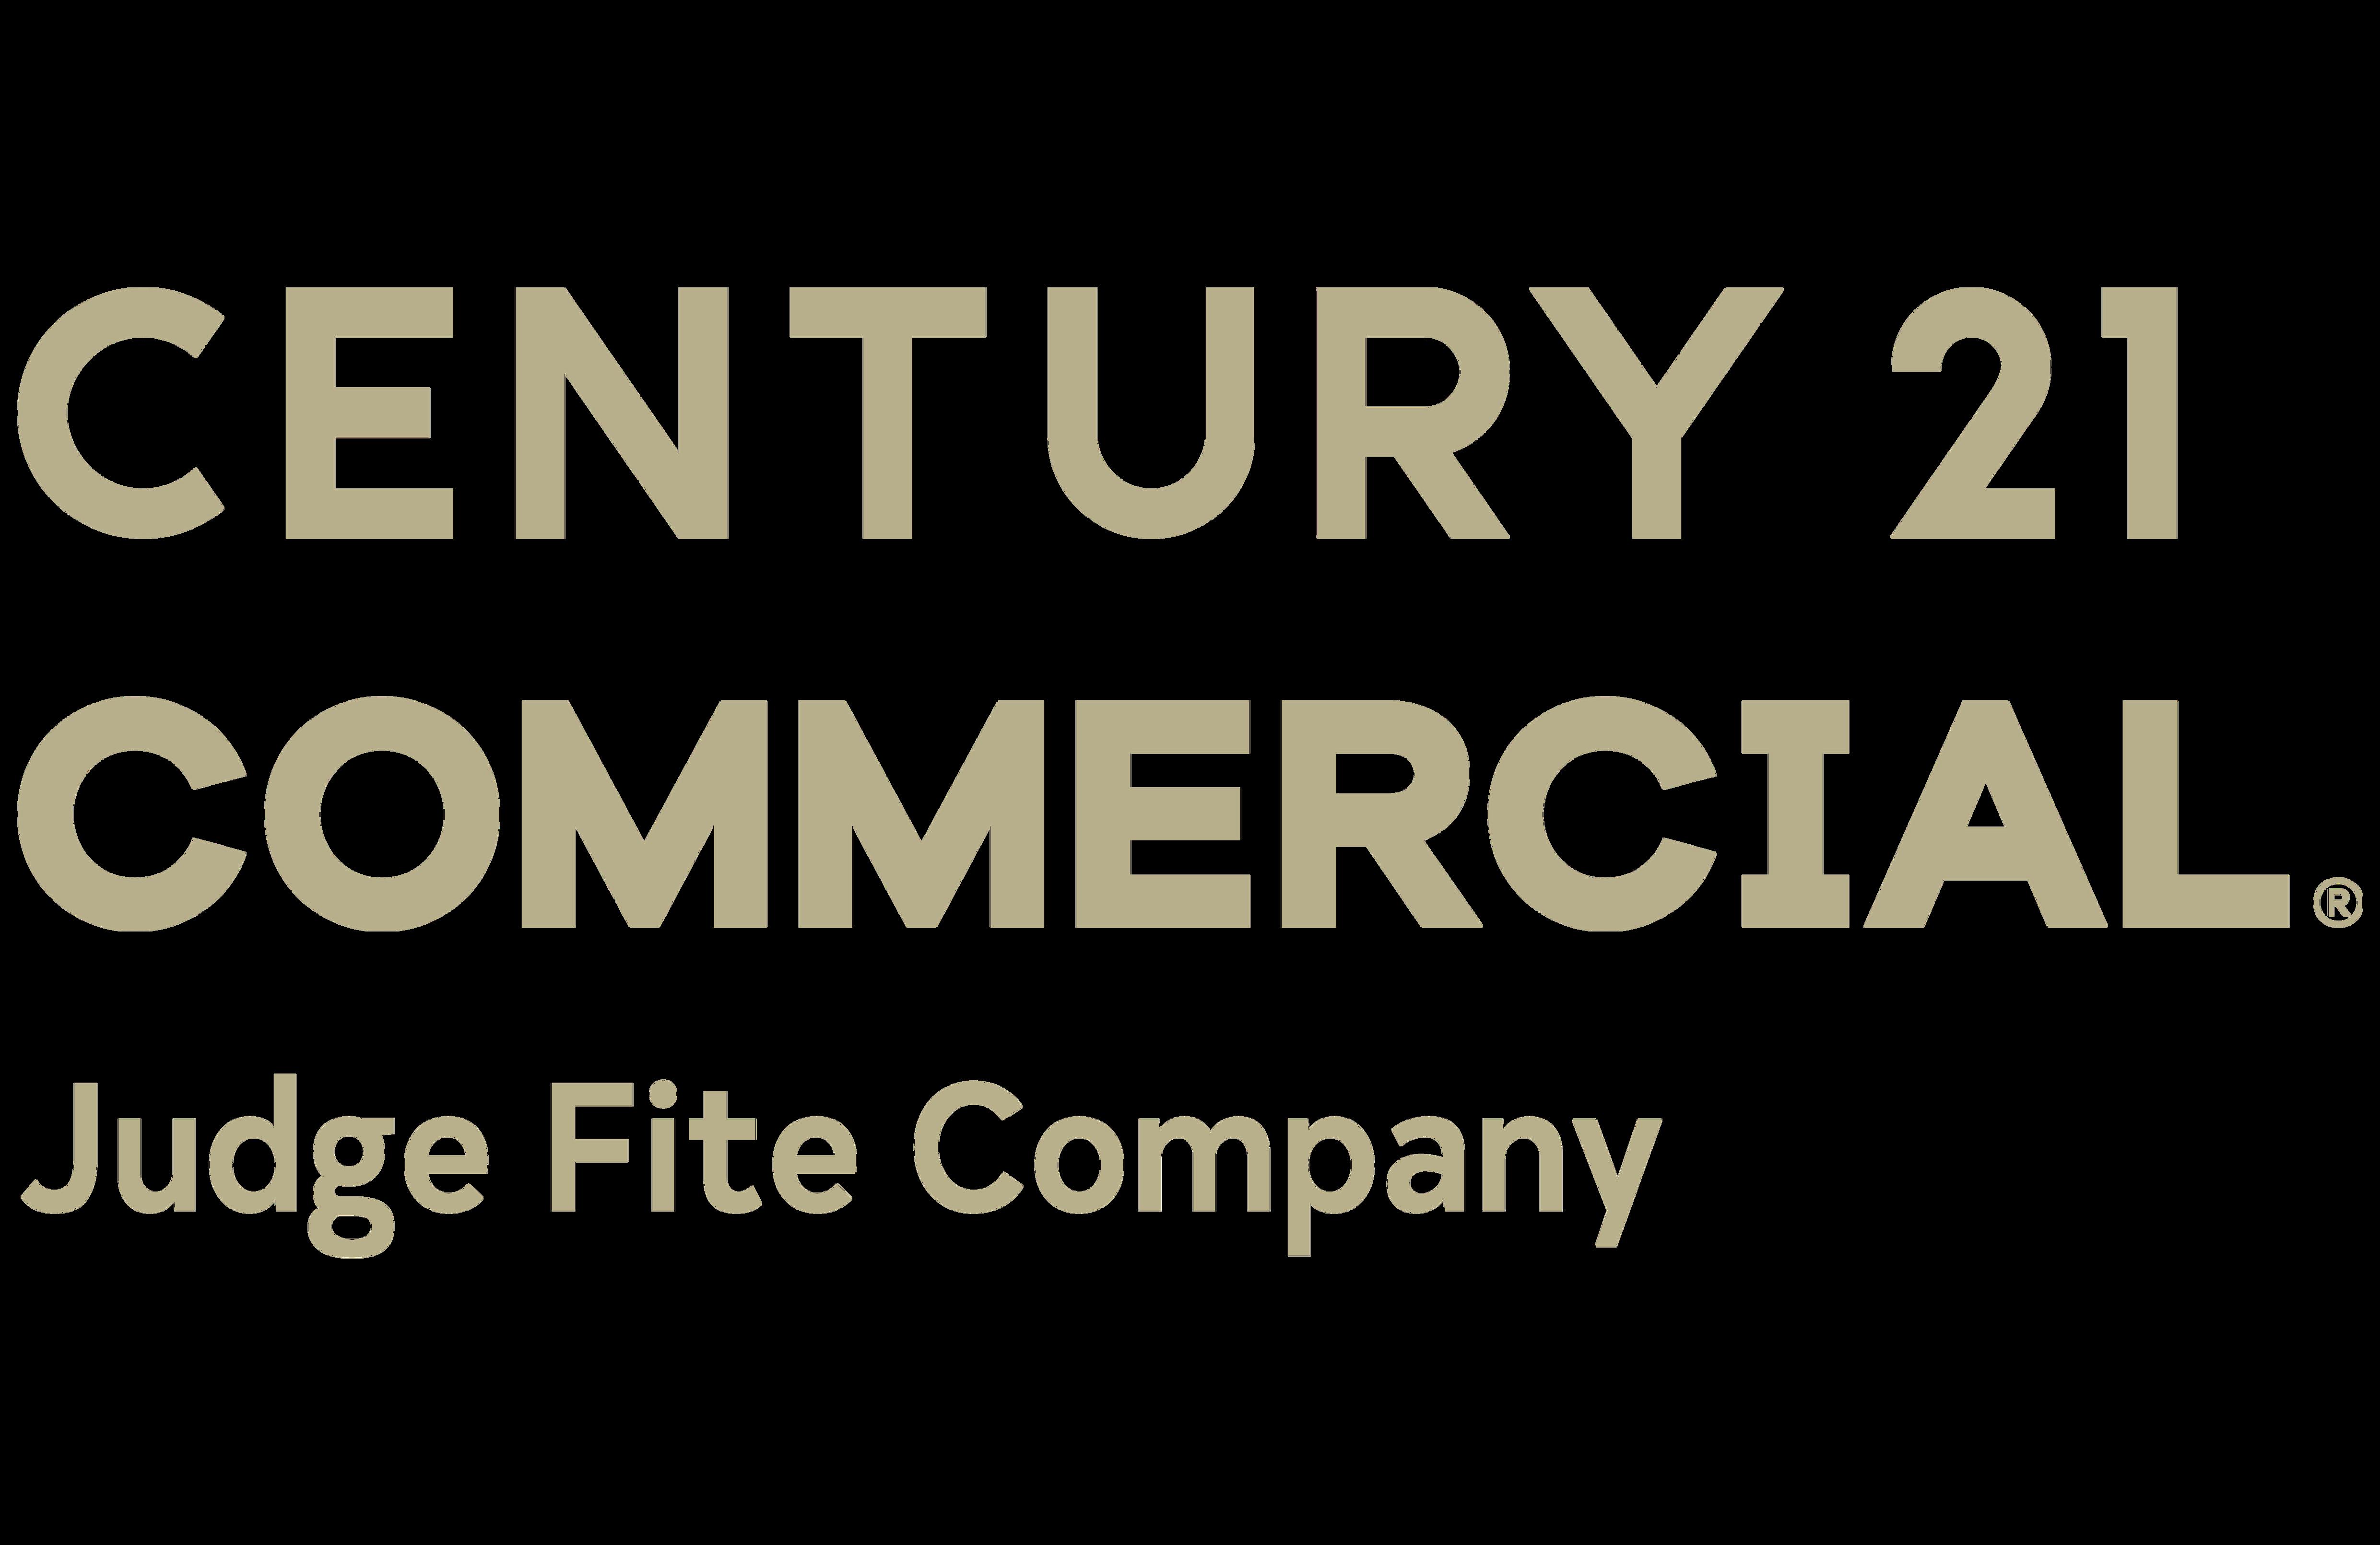 Randy Hudson of CENTURY 21 Judge Fite Company logo